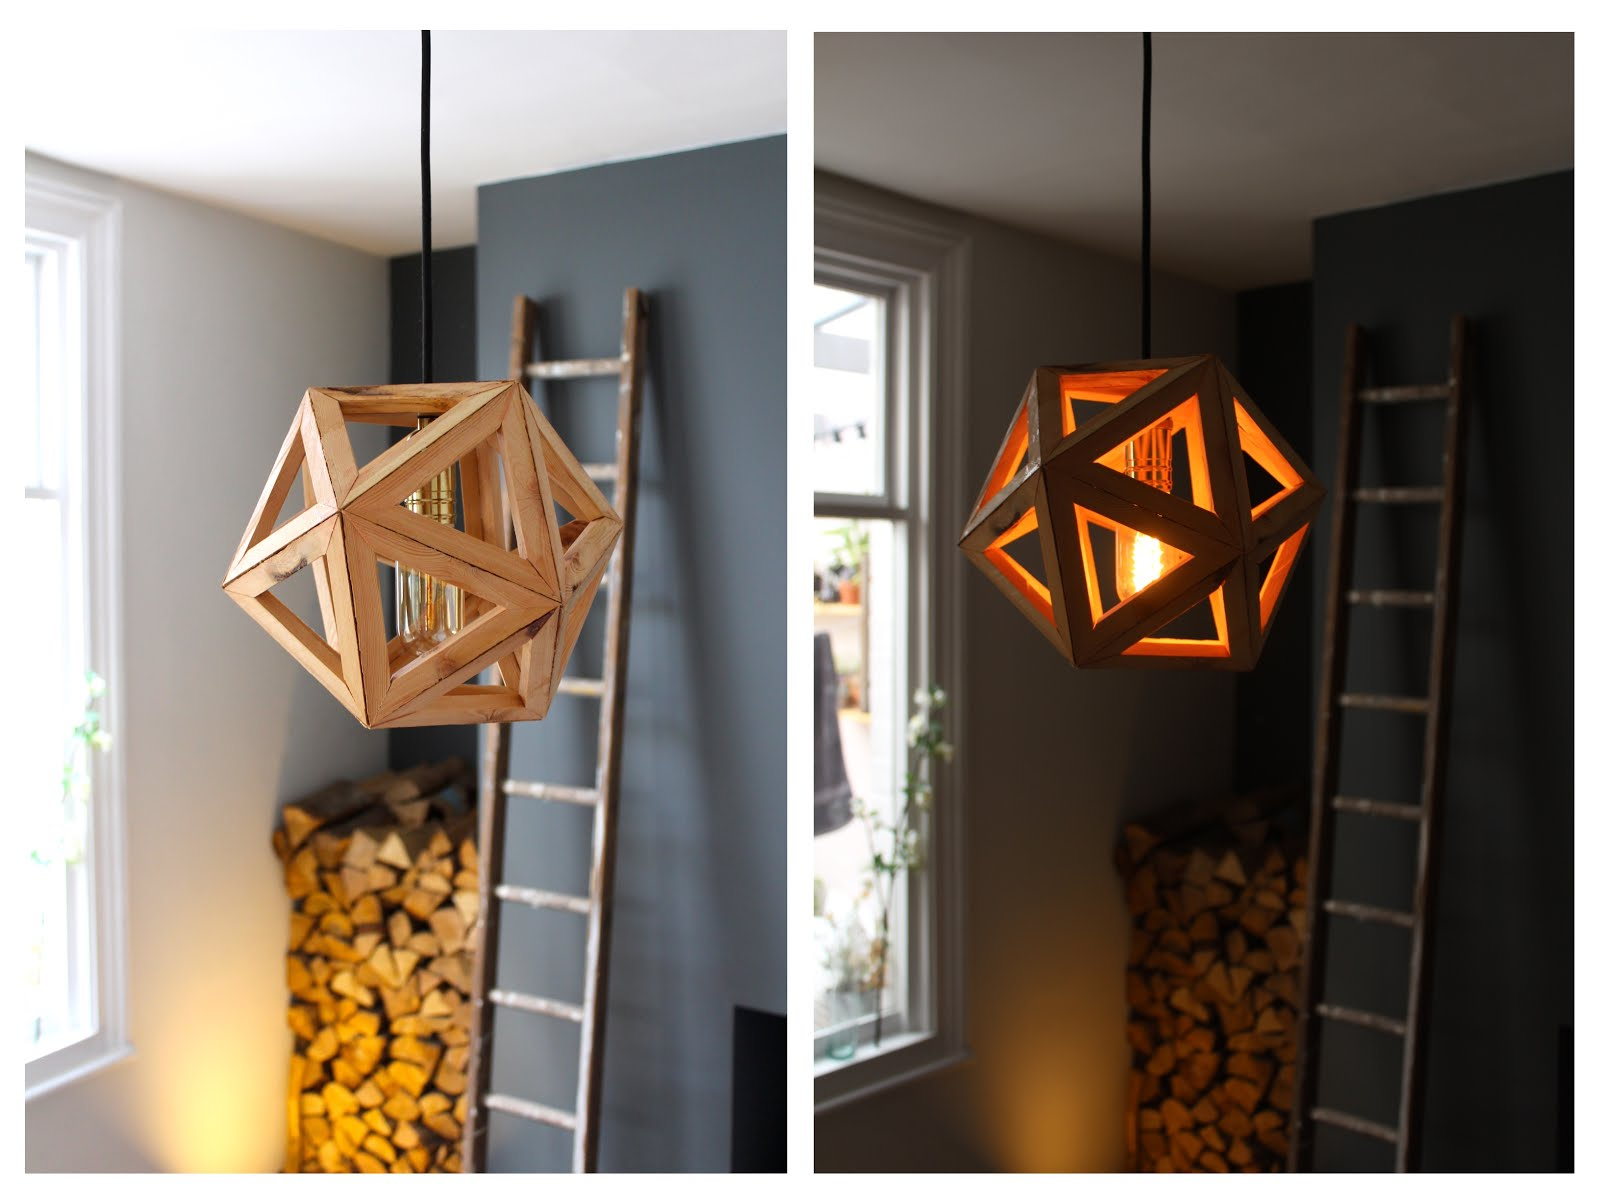 Diy Geometric Ceiling Light Icosahedron Kezzabeth Diy Renovation Blog